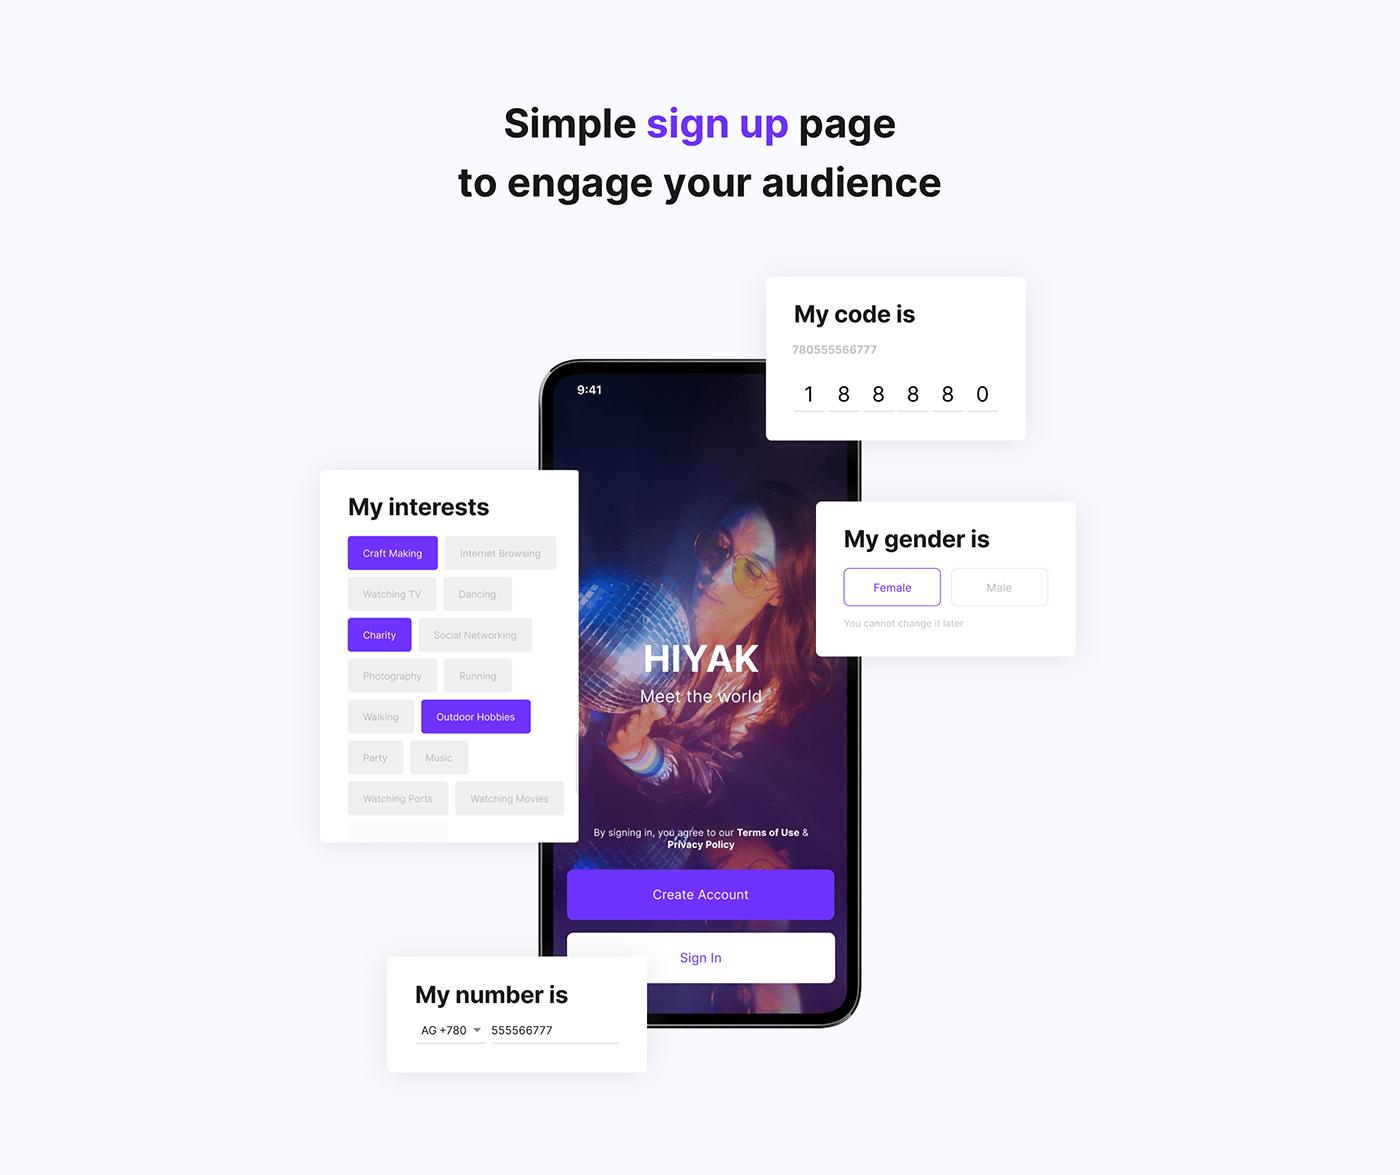 application branding  design illustrations Interface logo Mobile app Promotion UI/UX Web Design